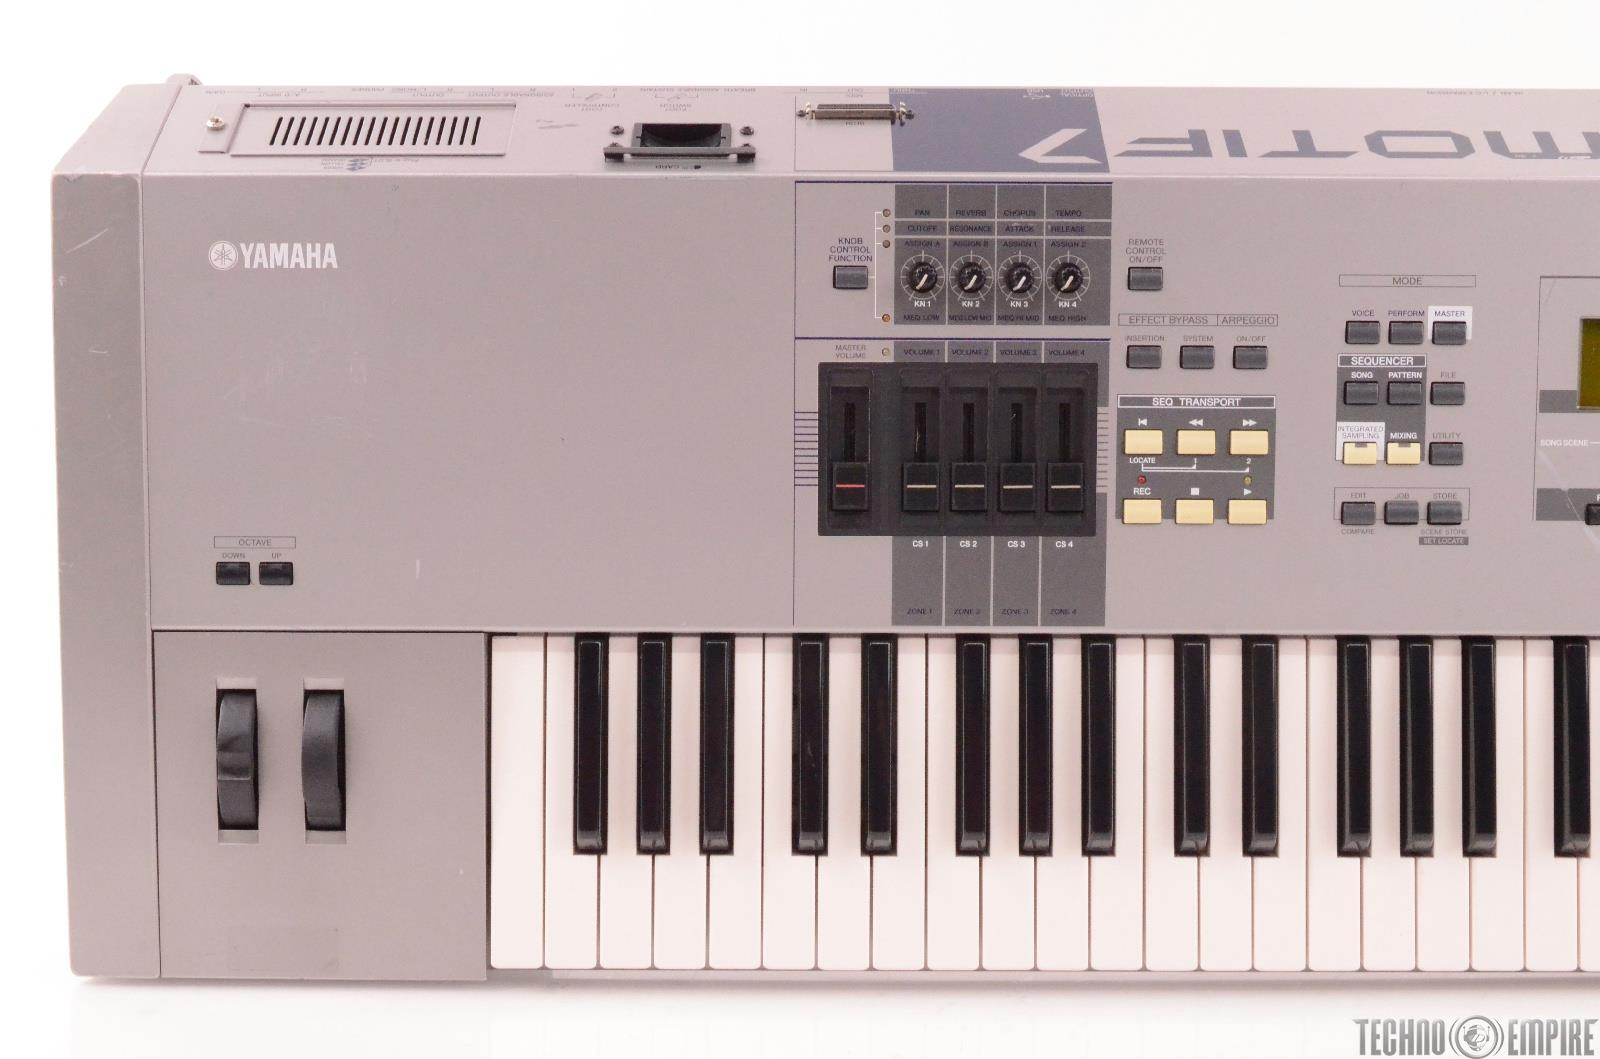 Yamaha motif 7 76 key keyboard music production for Yamaha motif keyboard